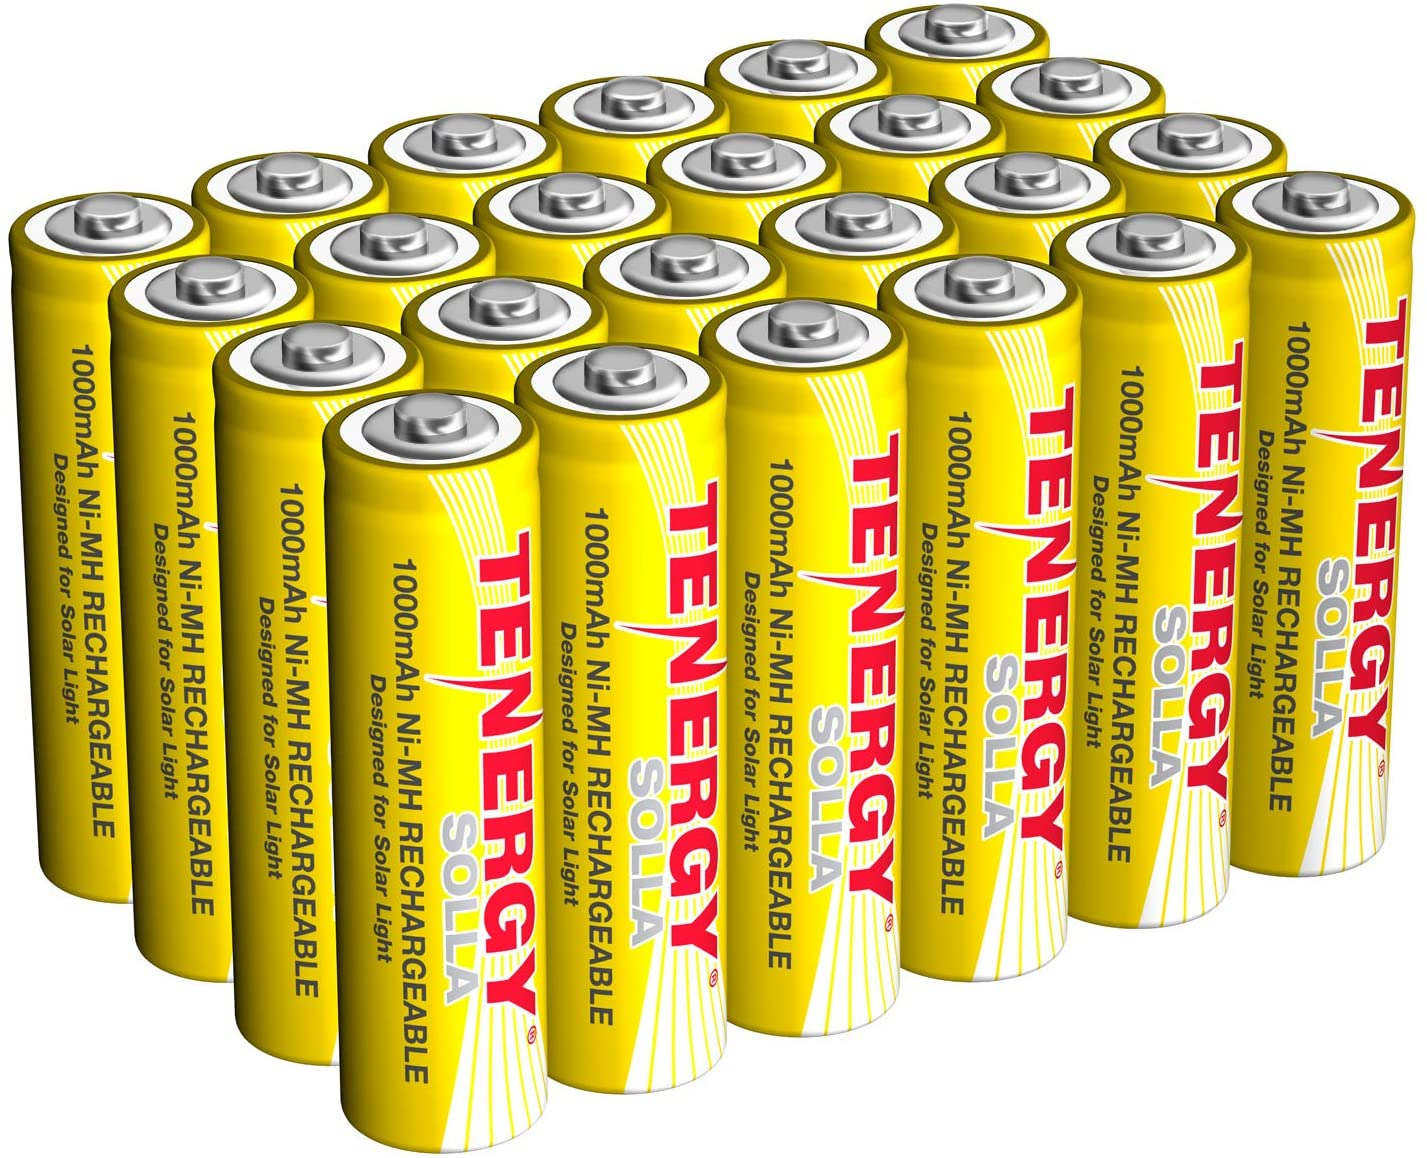 Tenergy Solla NiMH, 1,000 mAh Rechargeable Batteries